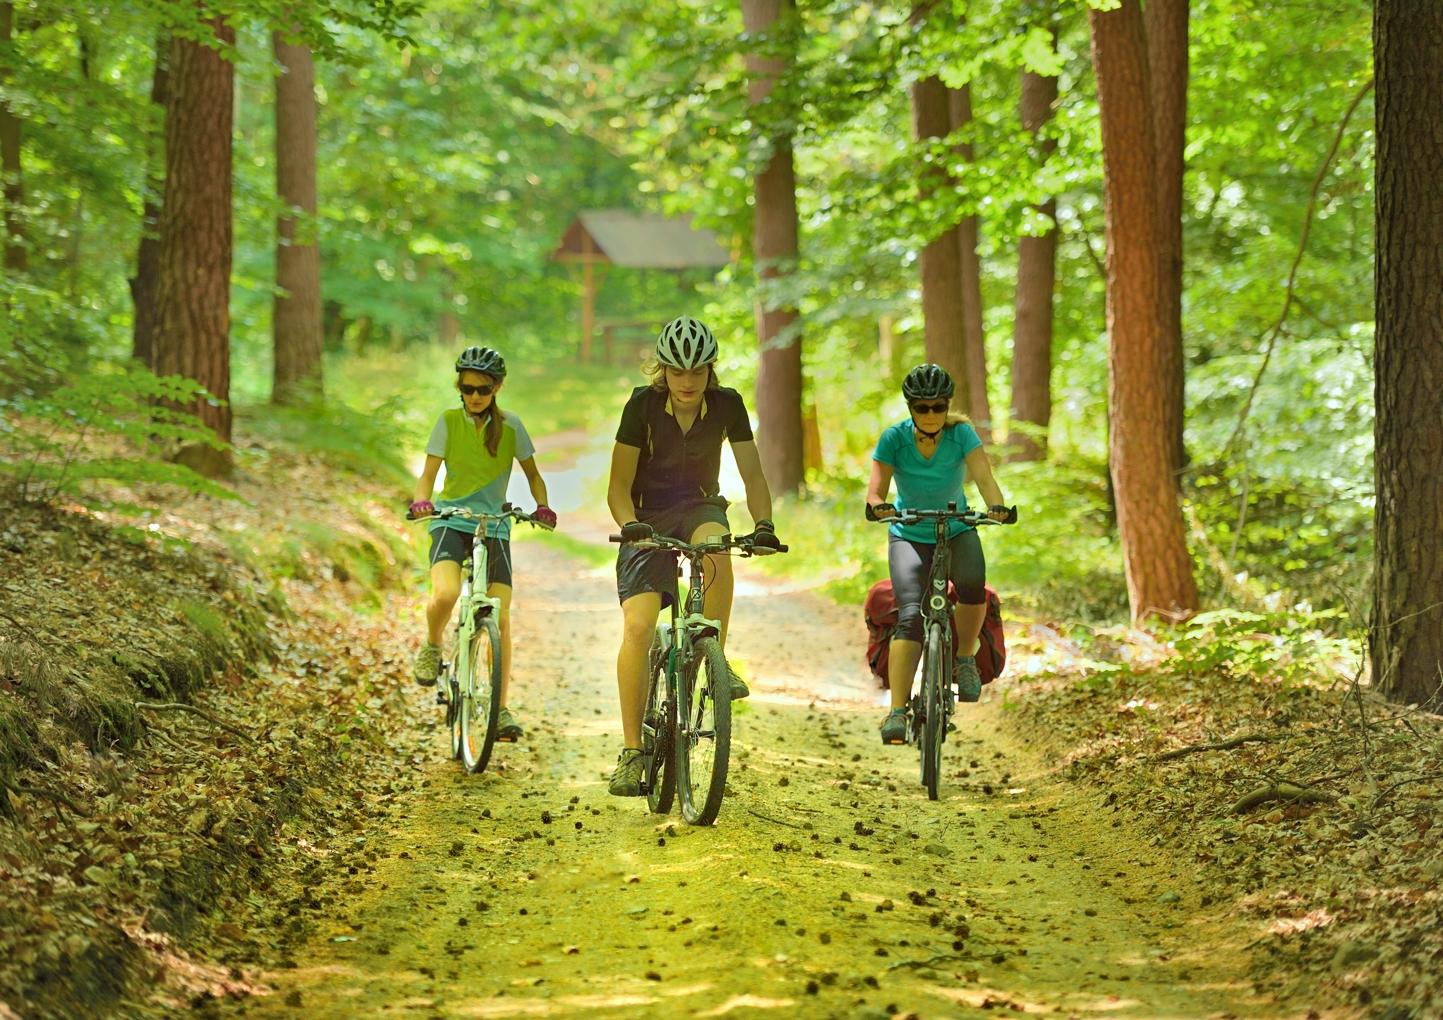 Barlinecko-Gorzowski park krajobrazowy fot. Piotr Chara